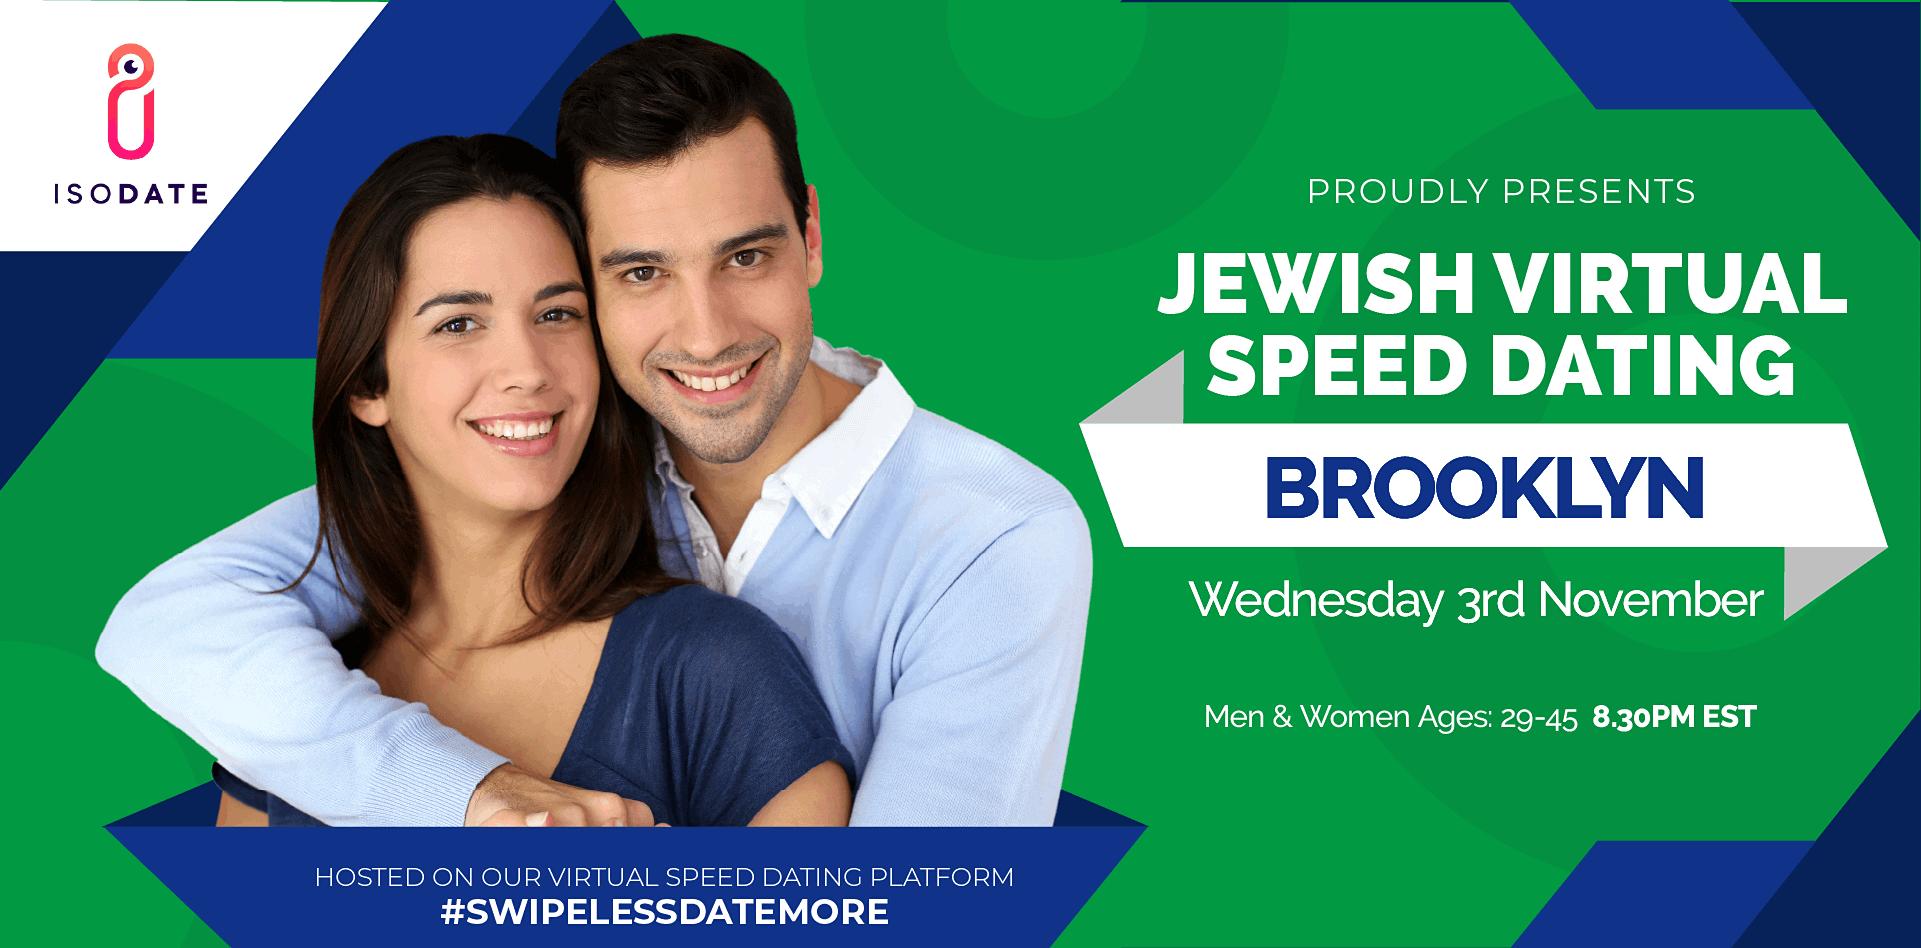 Isodate's Brooklyn Jewish Virtual Speed Dating